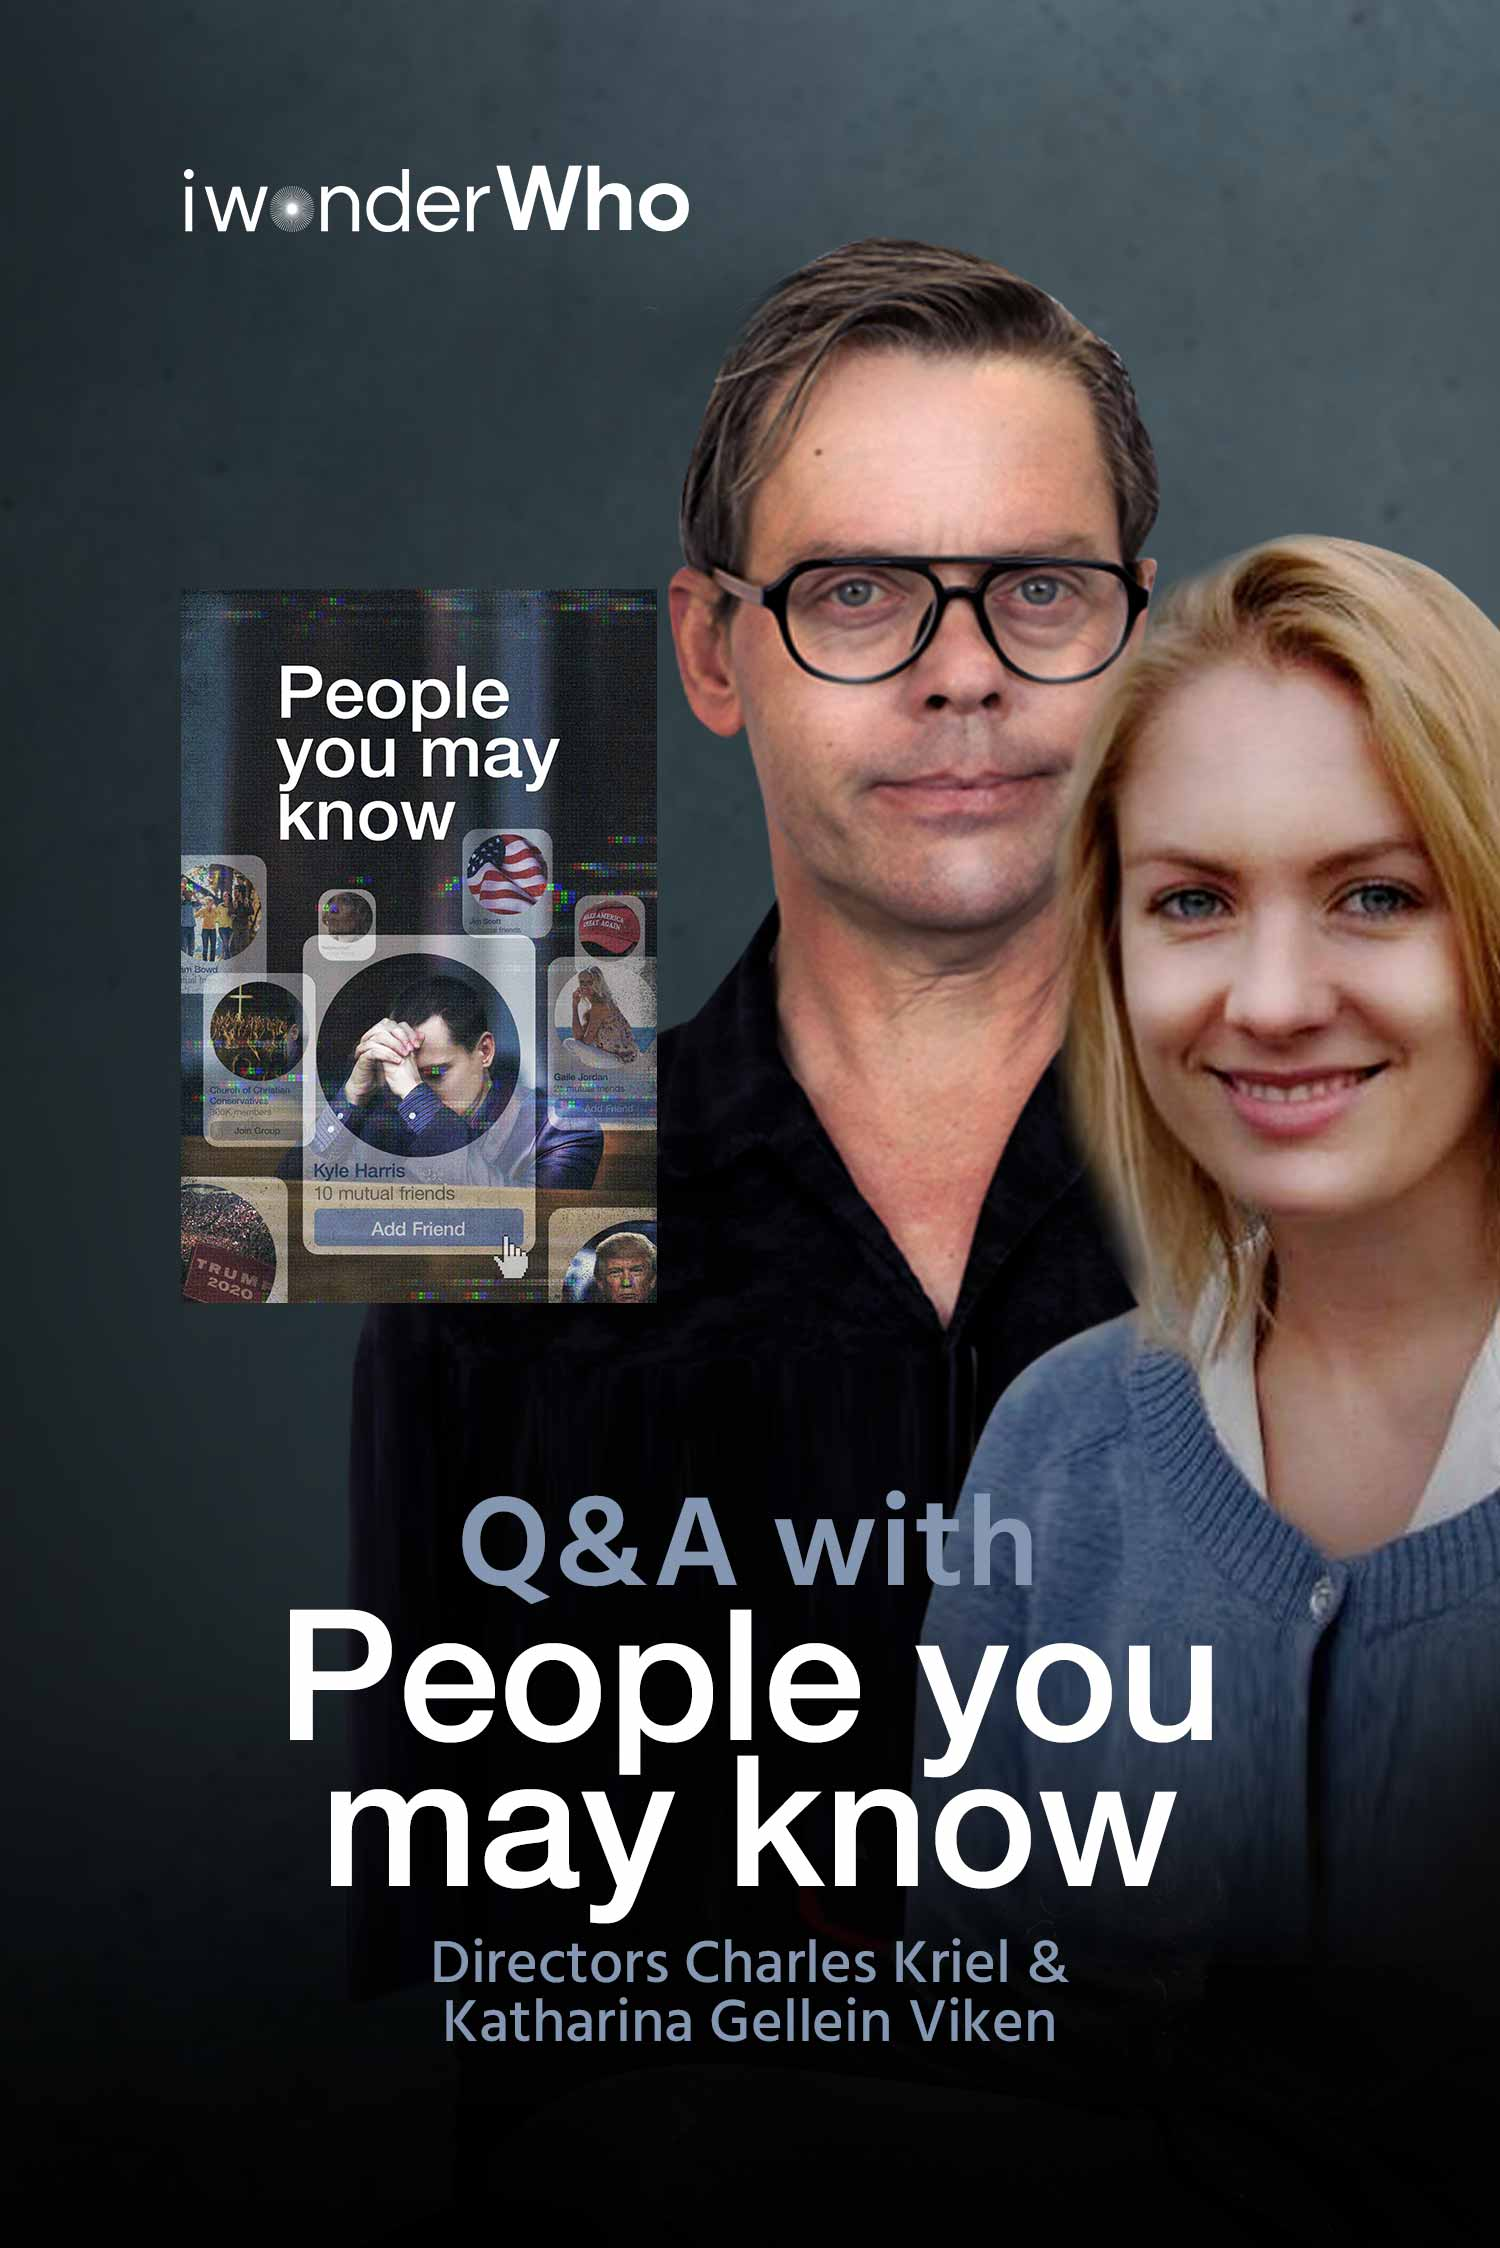 iwonderWho - Katharina Gellein Viken & Charles Kriel (People You May Know)